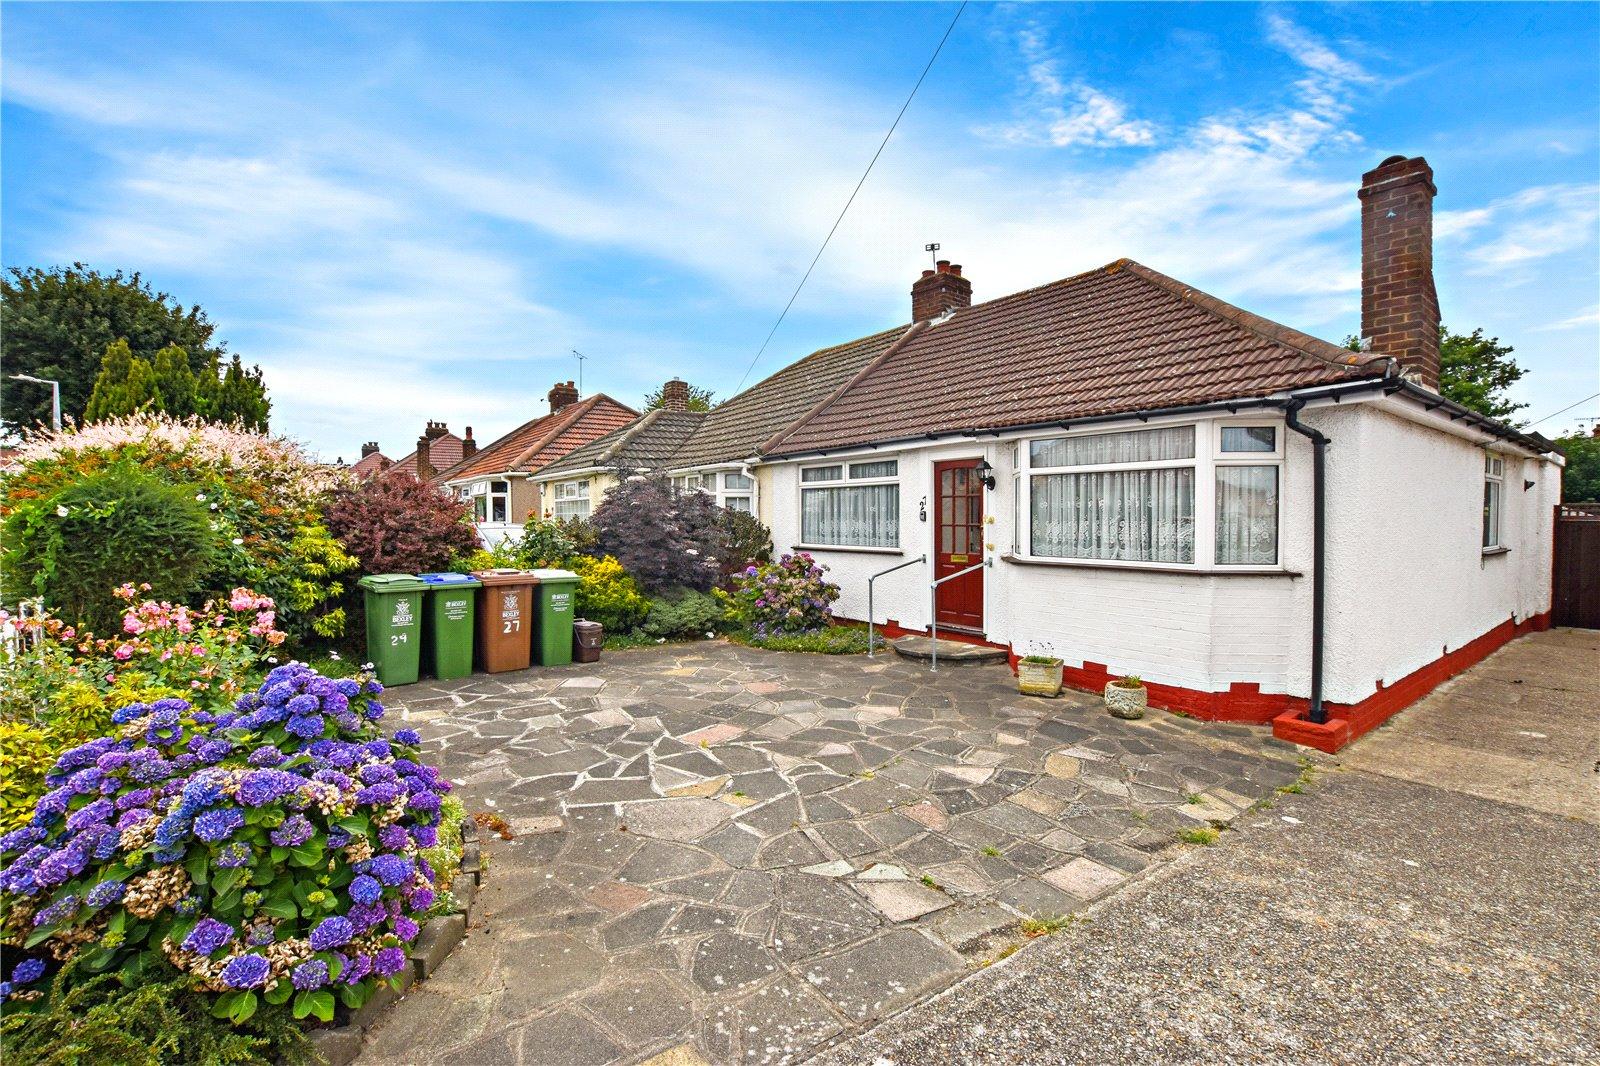 Francis Avenue, Bexleyheath, Kent, DA7